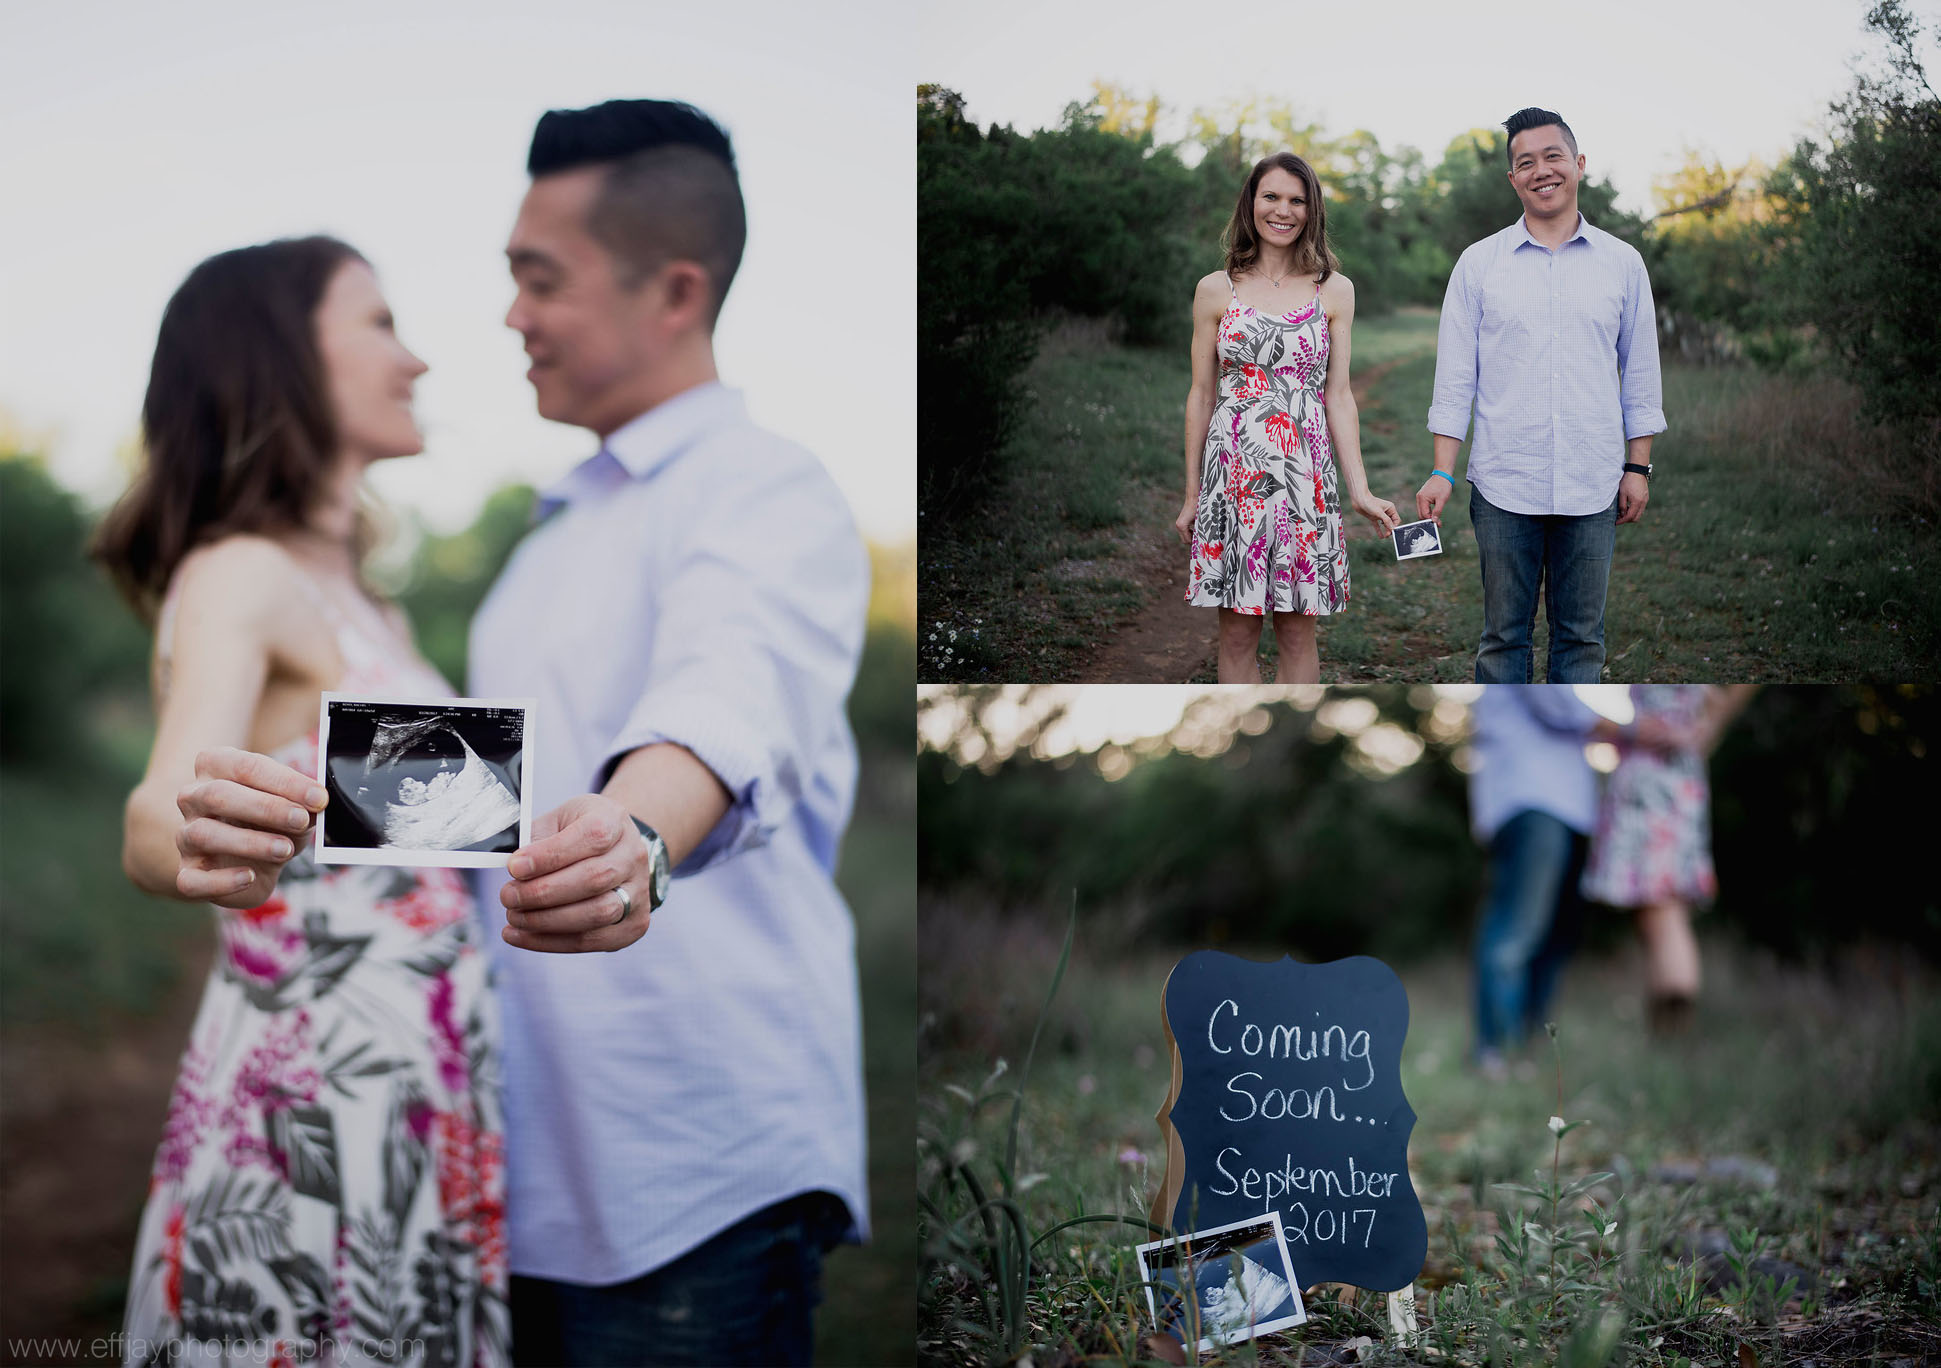 Austin Photographer pregnancy announcement session at pace bend park 002.jpg